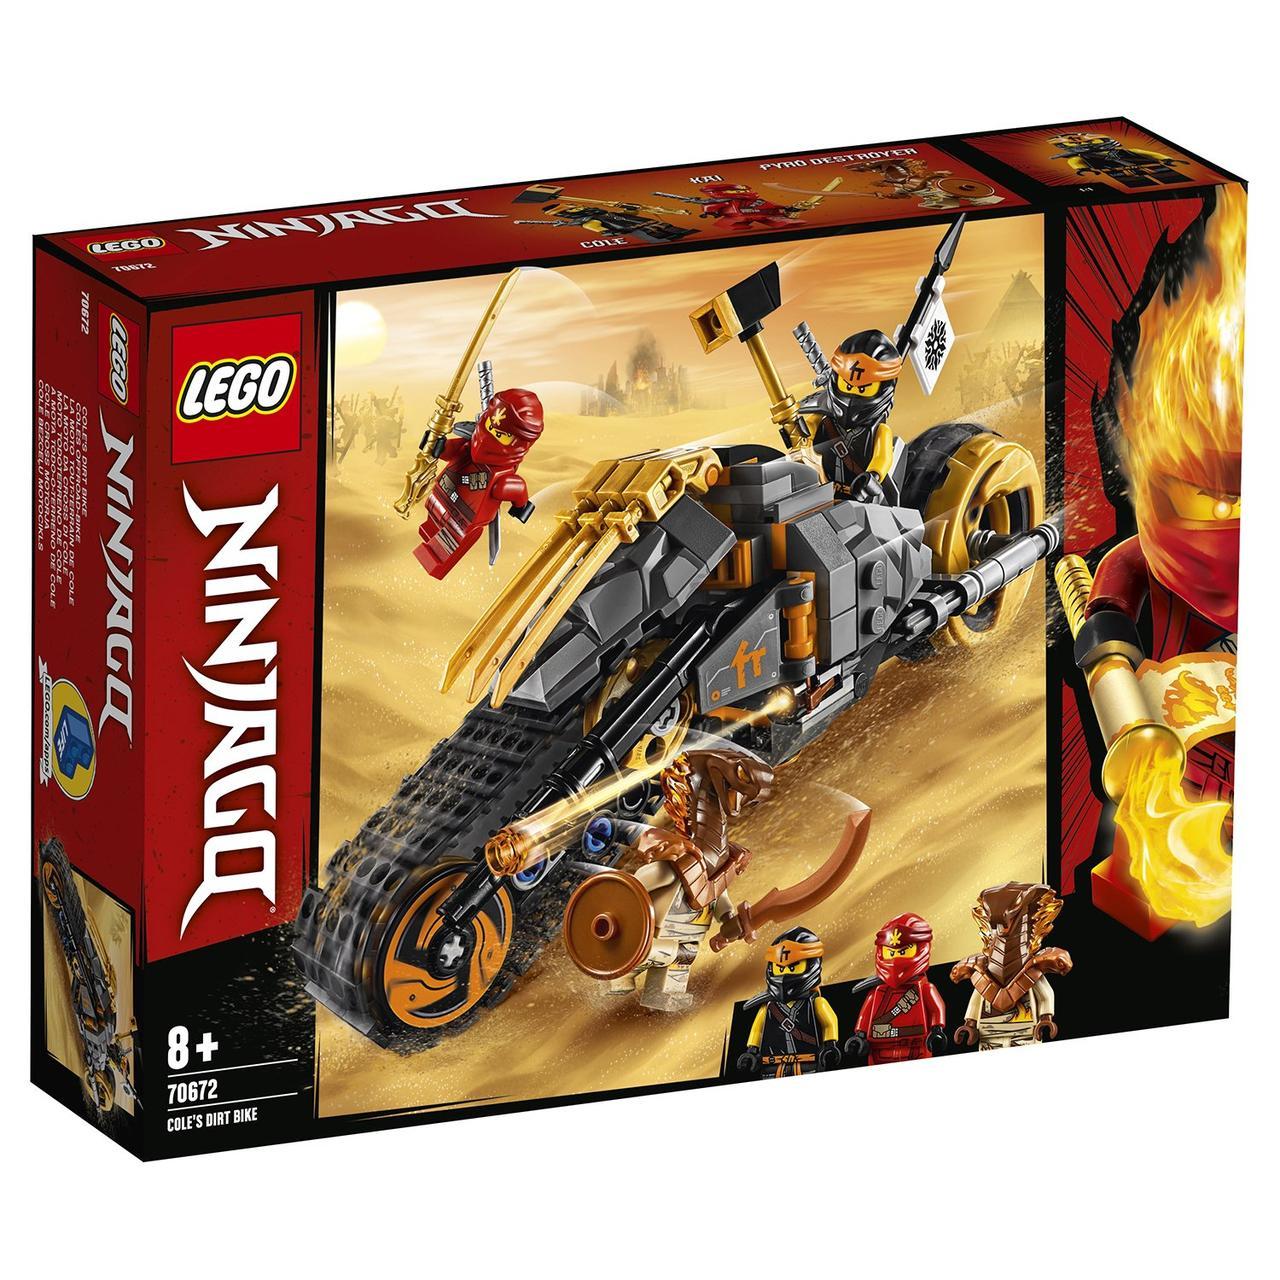 70672 Lego Ninjago Раллийный мотоцикл Коула, Лего Ниндзяго